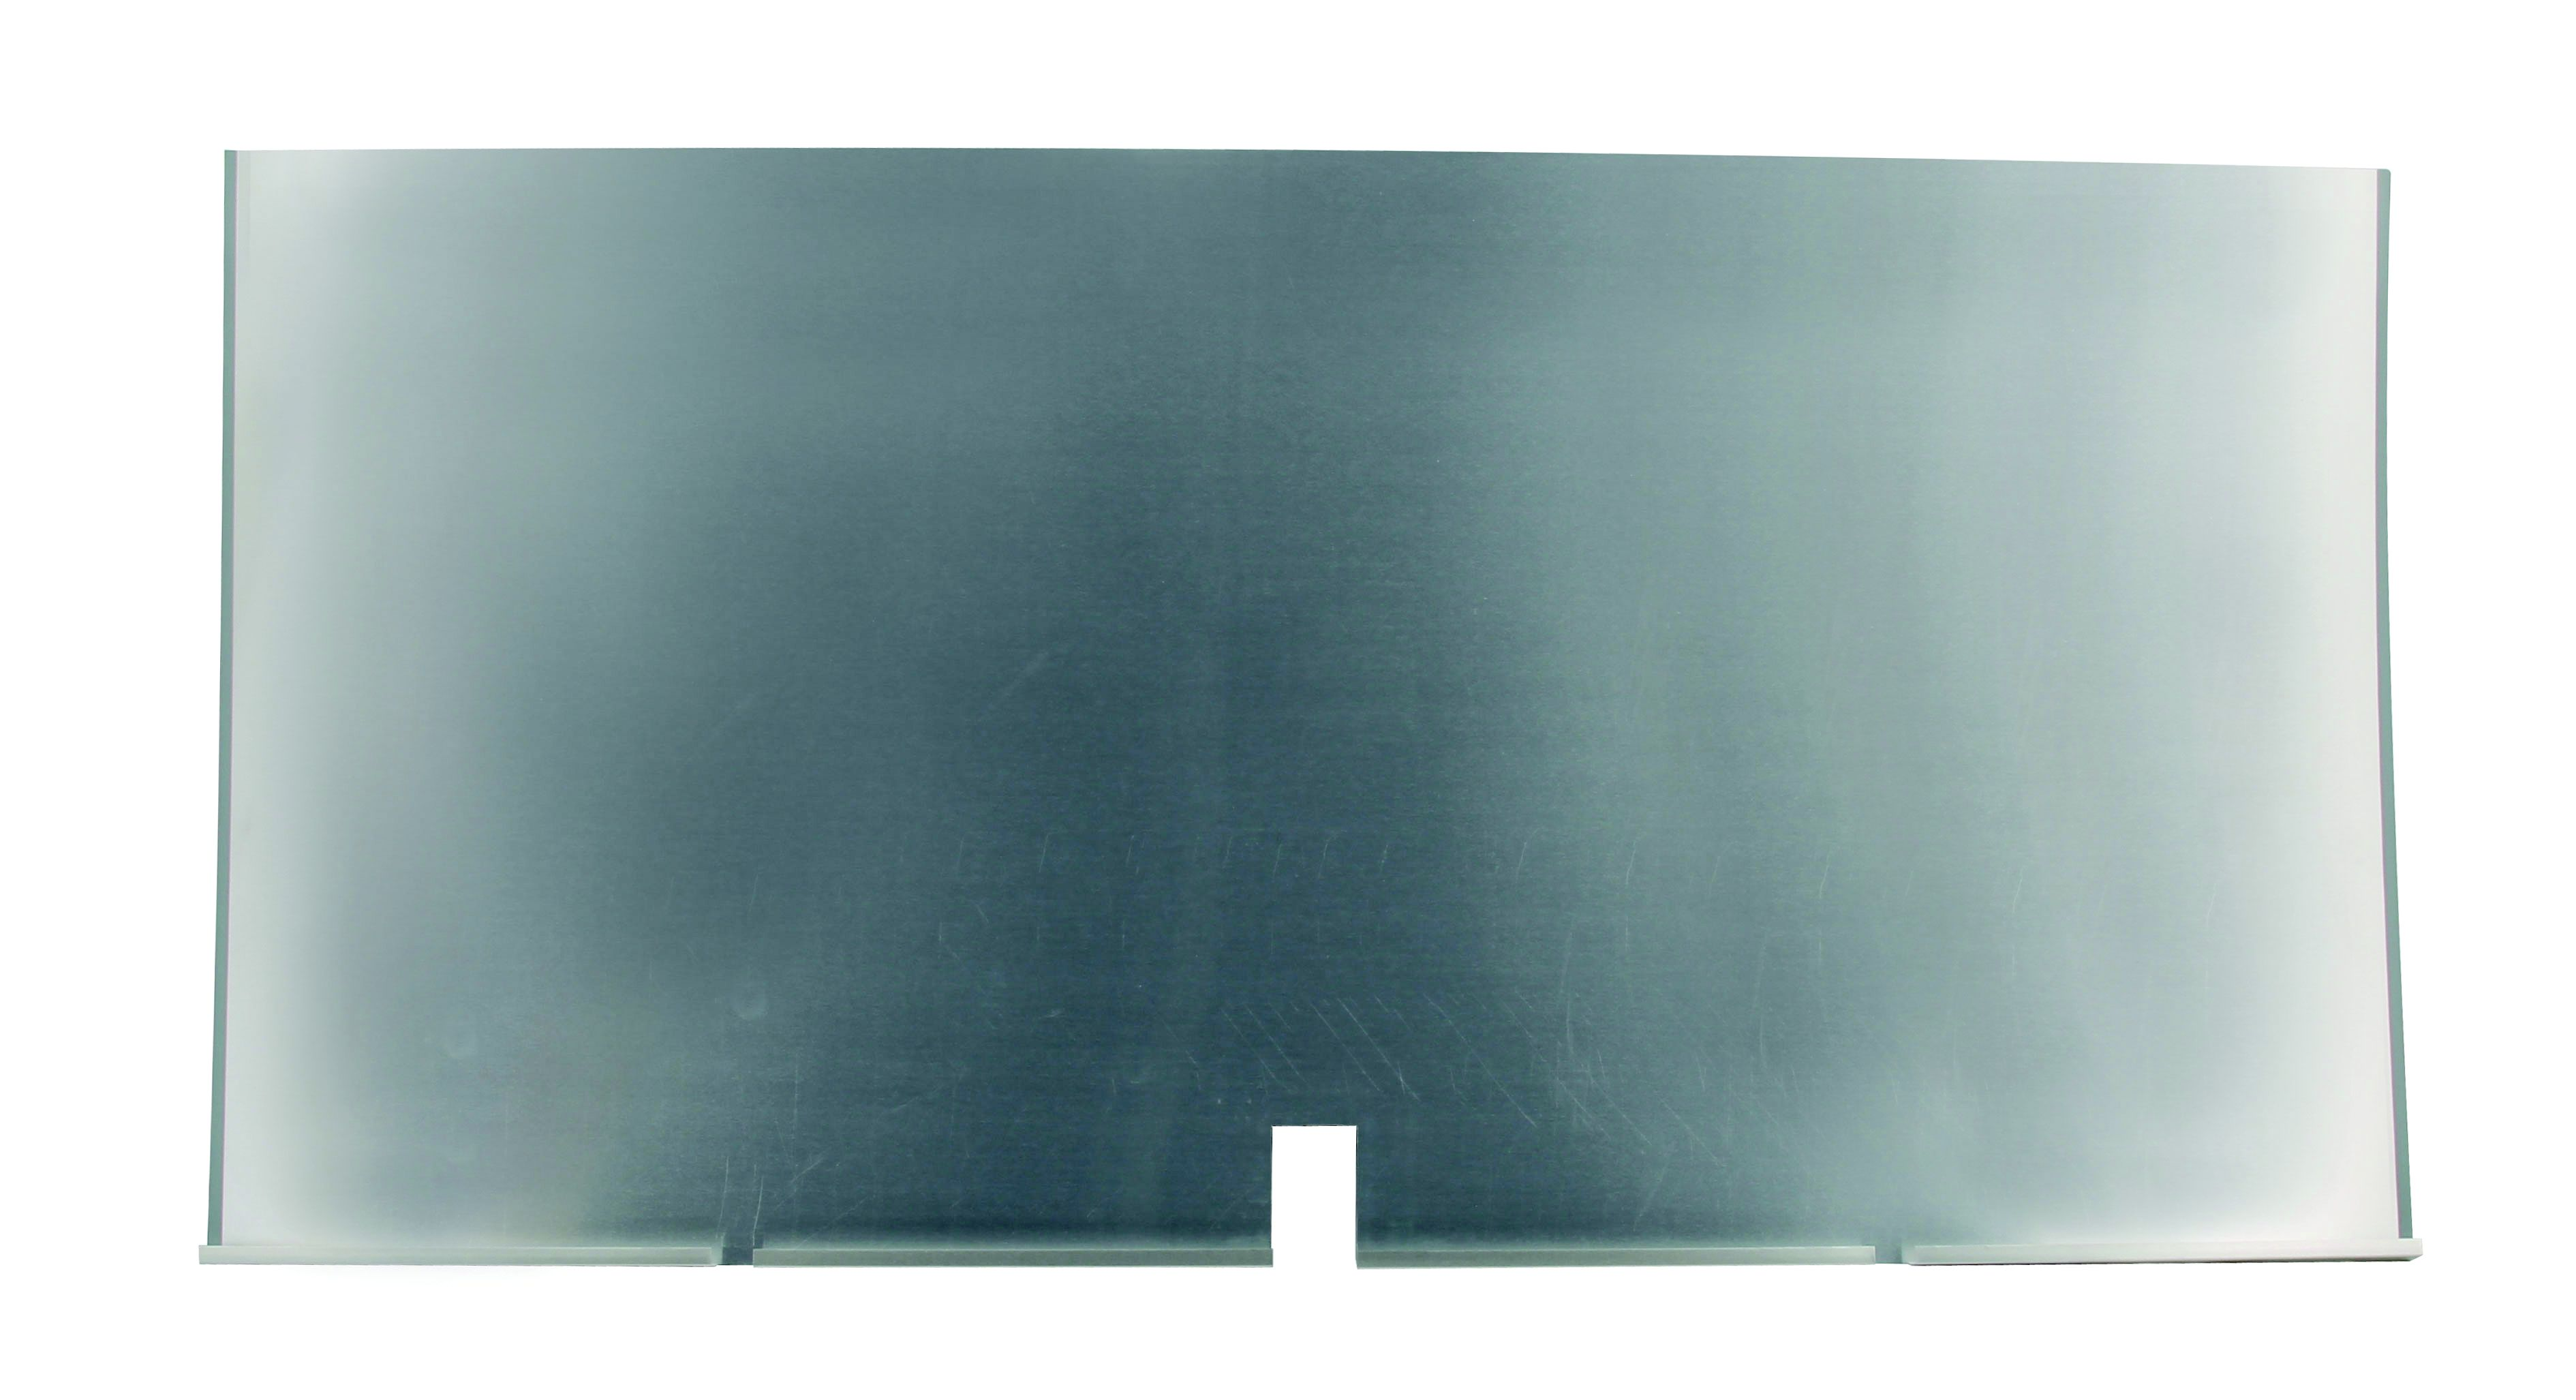 premium kitchens stainless steel effect sink liner